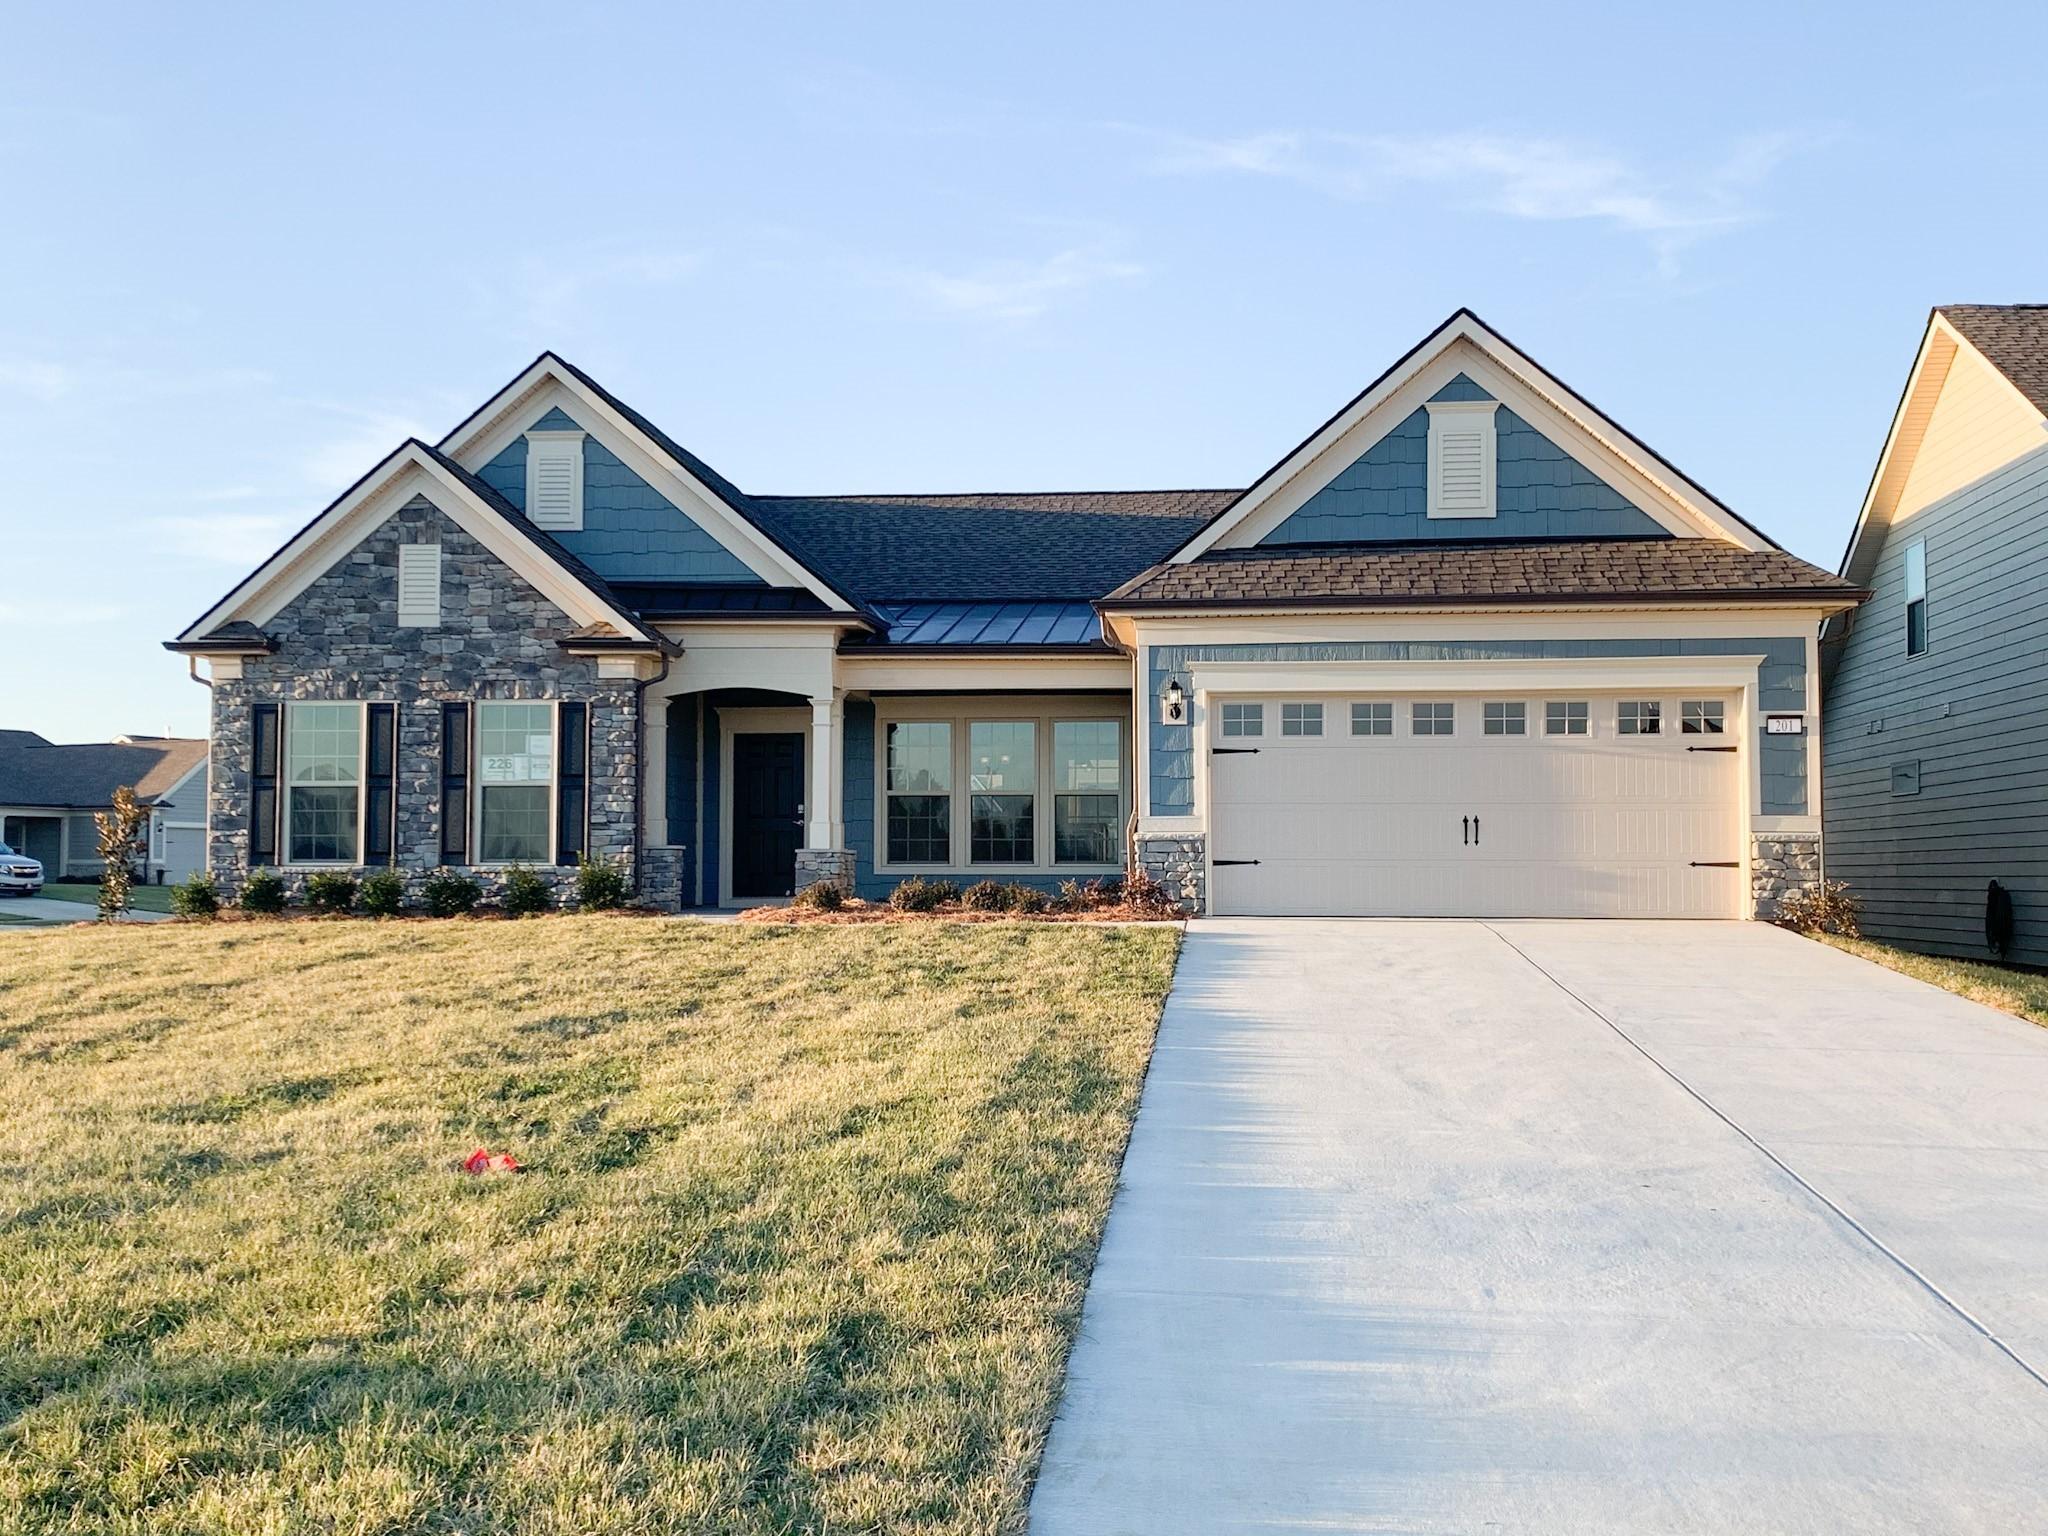 201 Franklin Springs #226, Spring Hill, TN 37174 - Spring Hill, TN real estate listing